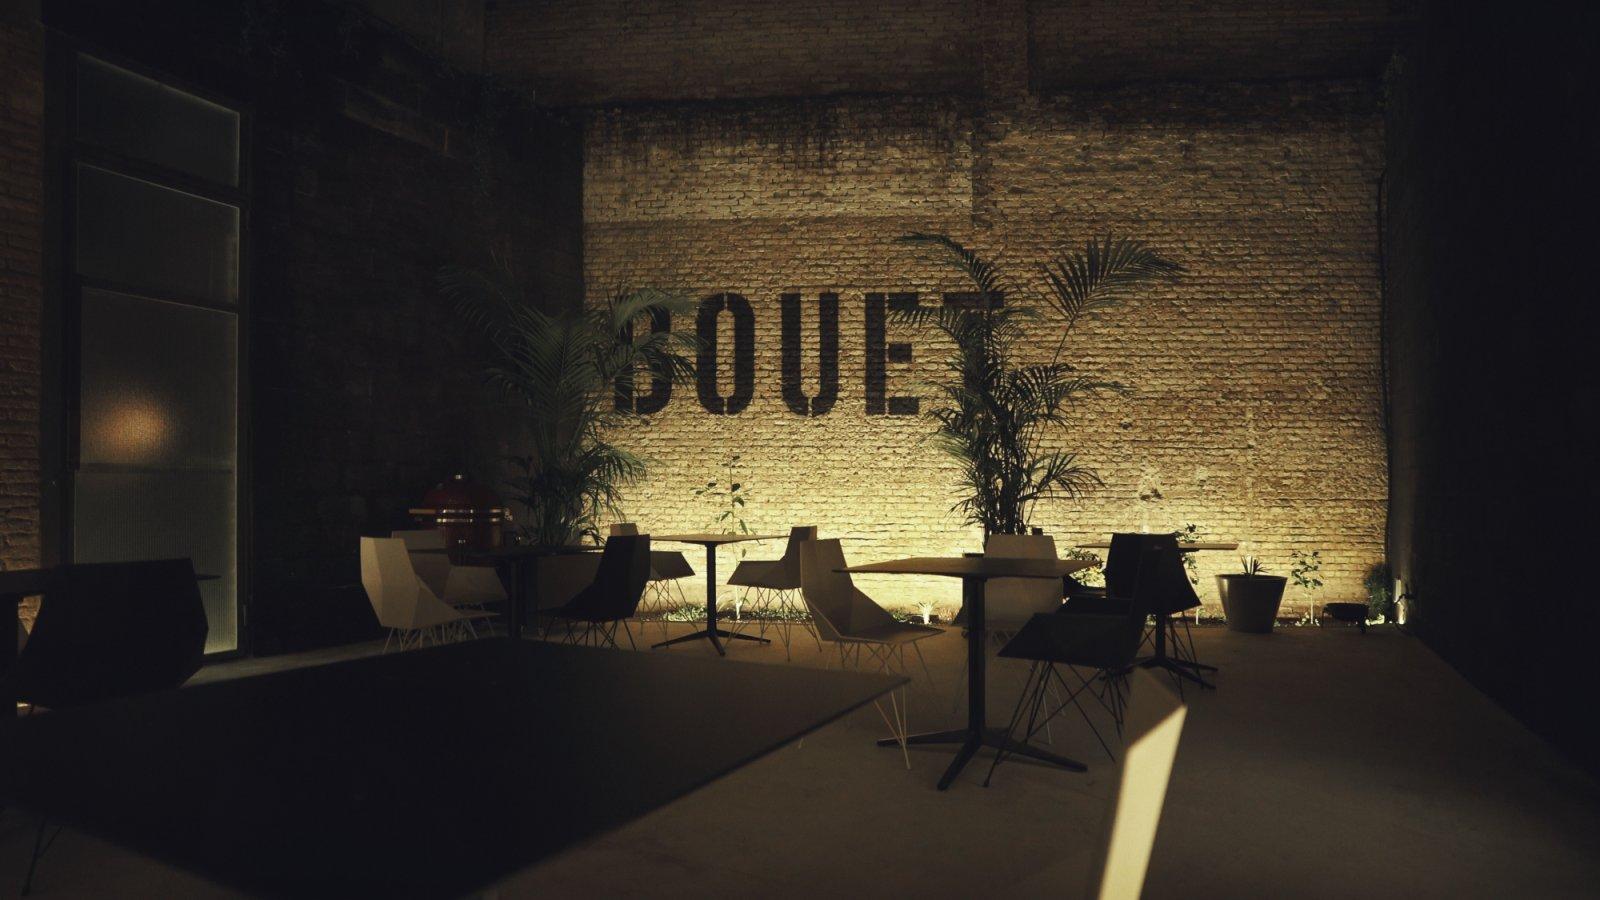 Bouet Restaurant